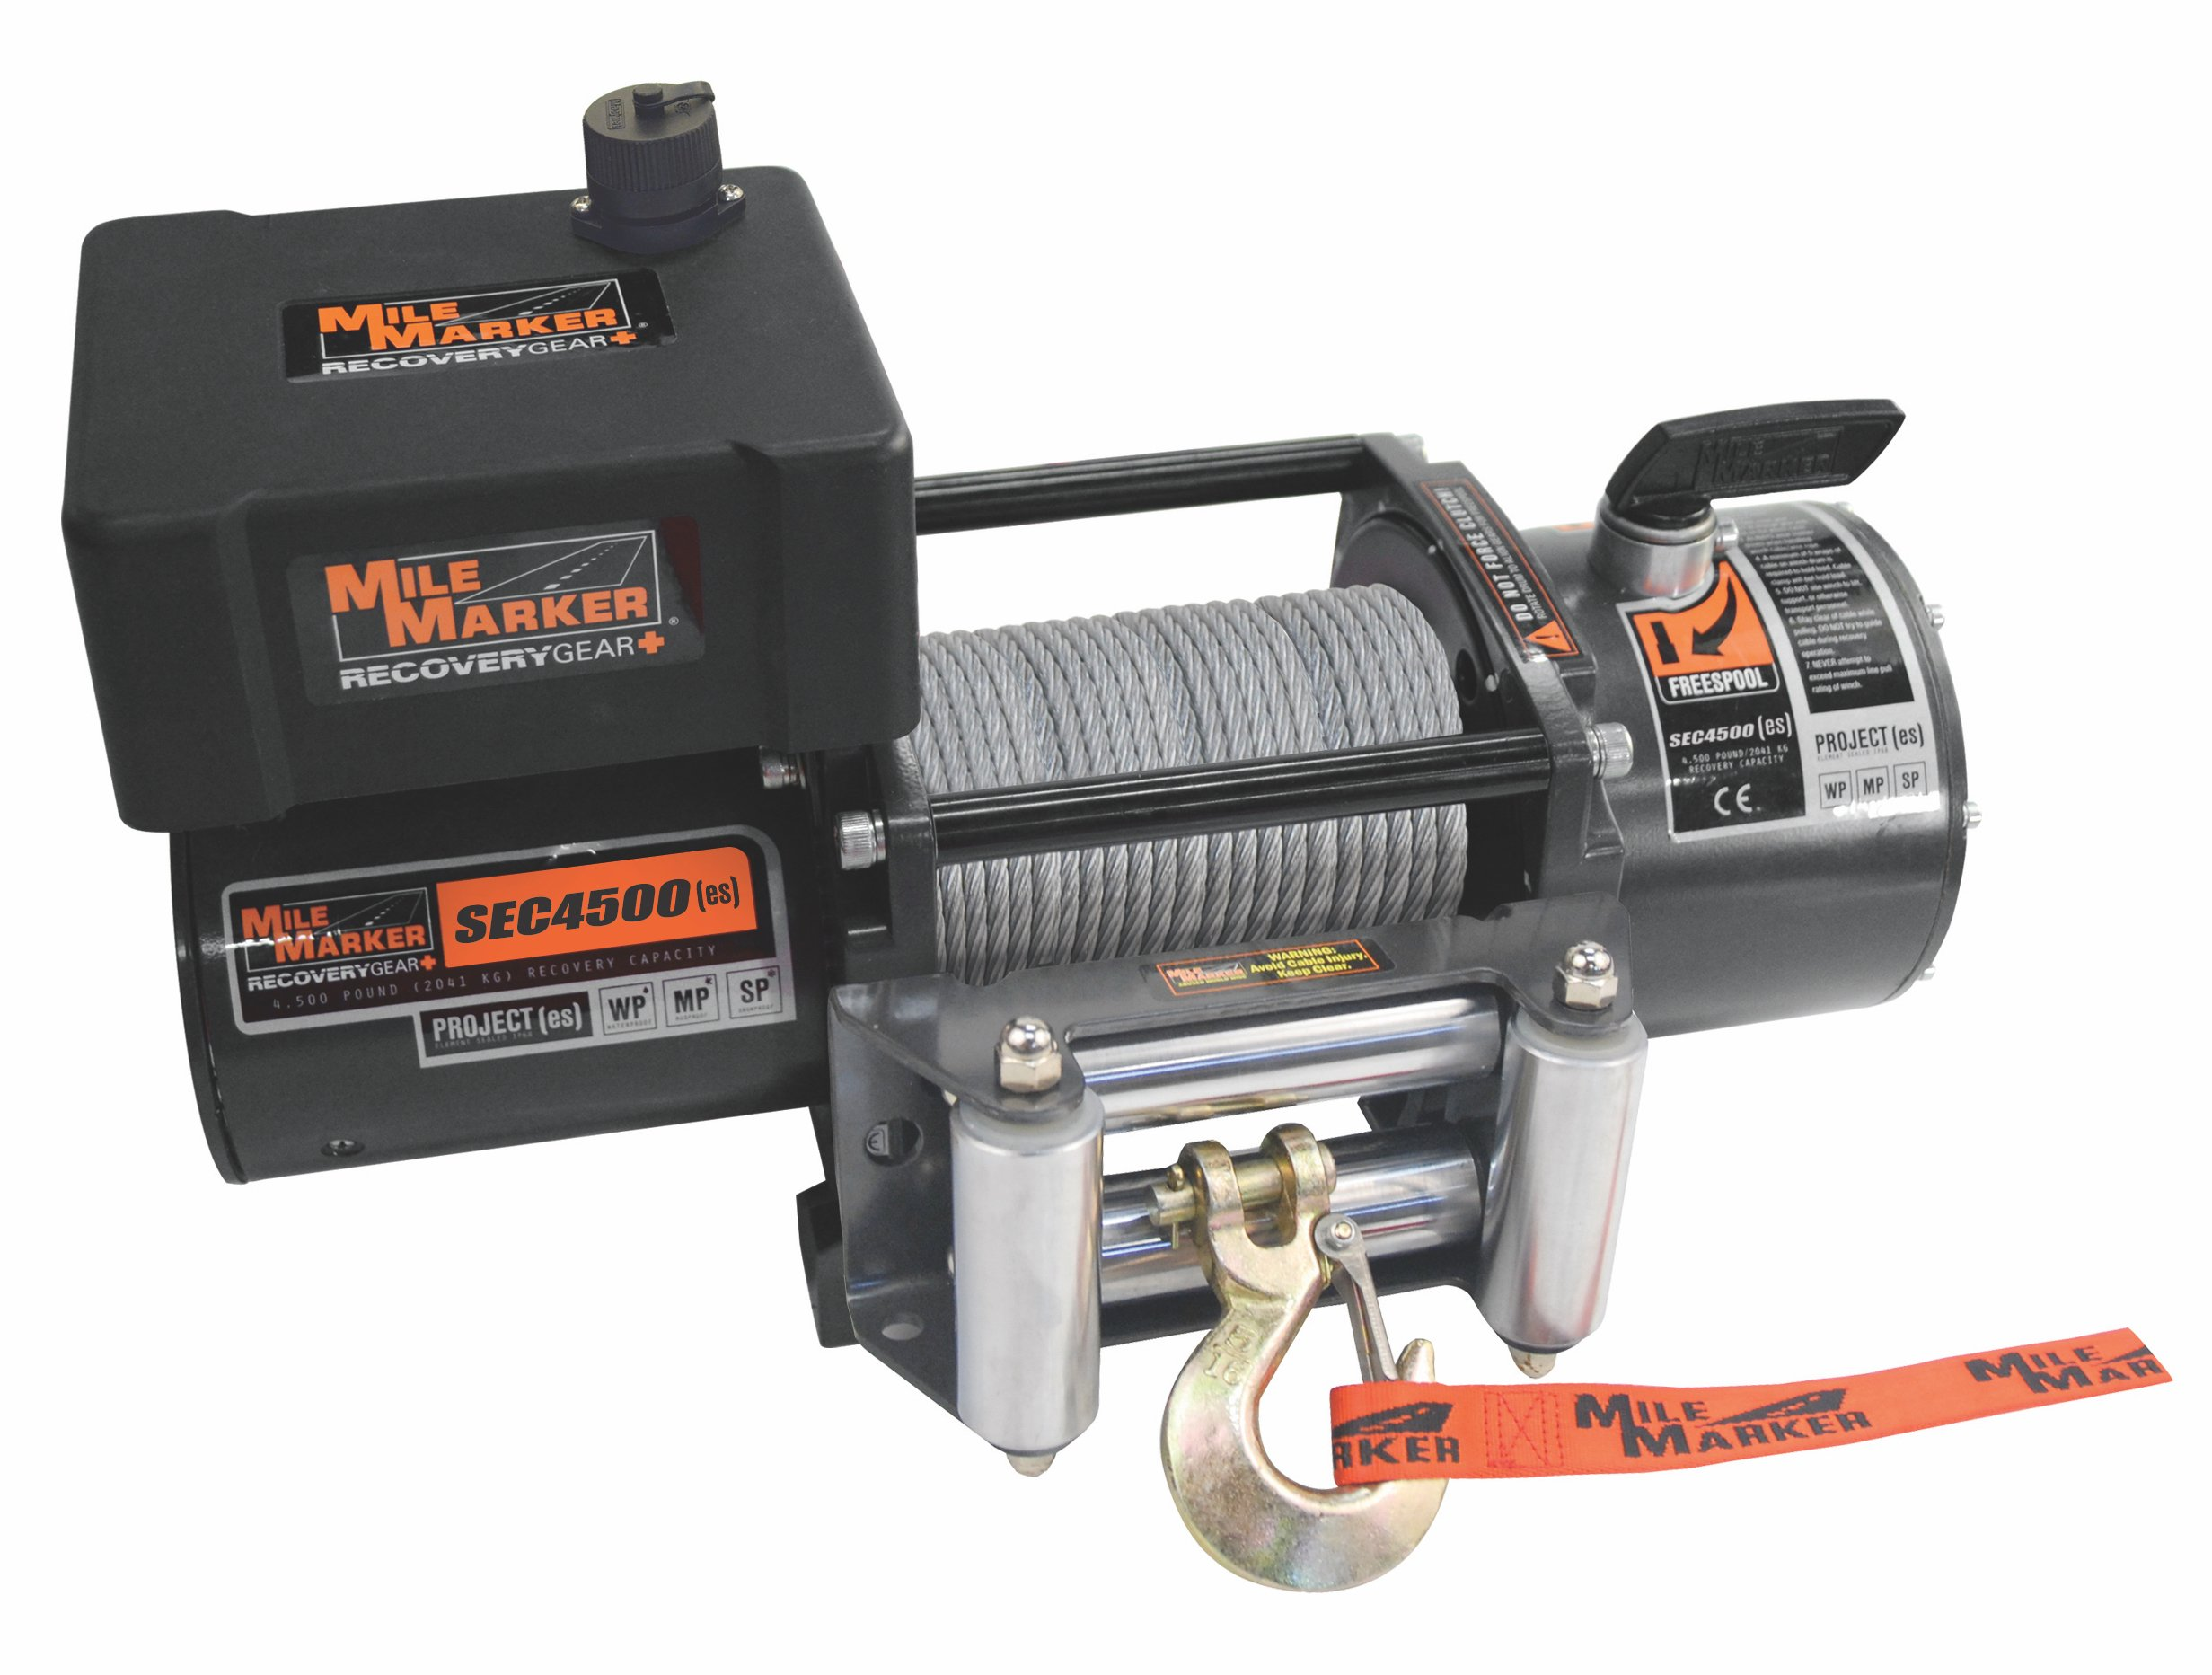 Mile Marker SEC4500(es) Trailer/UTV/Side-By-Side Premium Sealed Electric Winch - 4,500 lb. Capacity